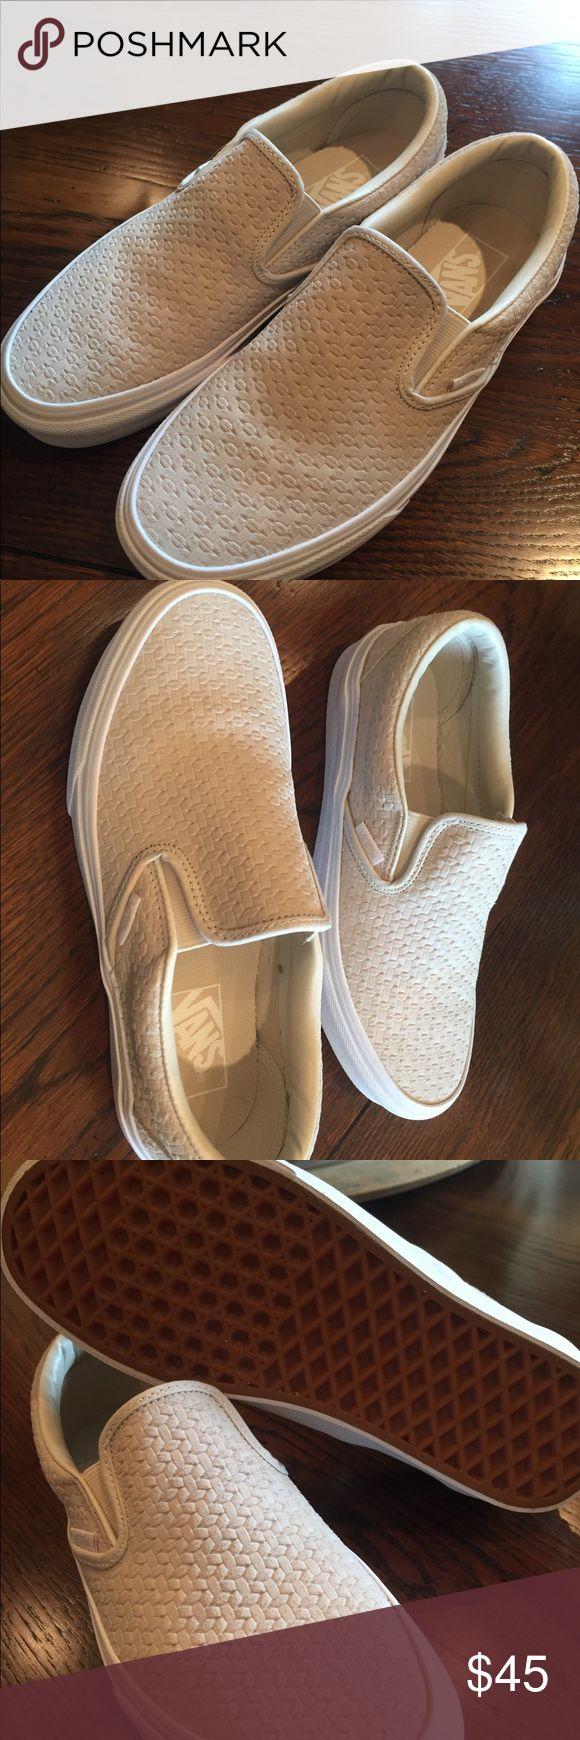 VANS slip on tennis shoes-BRAND NEW Vans classic slip ons, suede embossed weave in birch/true white (light tan/cream color). Never been worn. Brand new women's size 7.5. No box Vans Shoes Sneakers